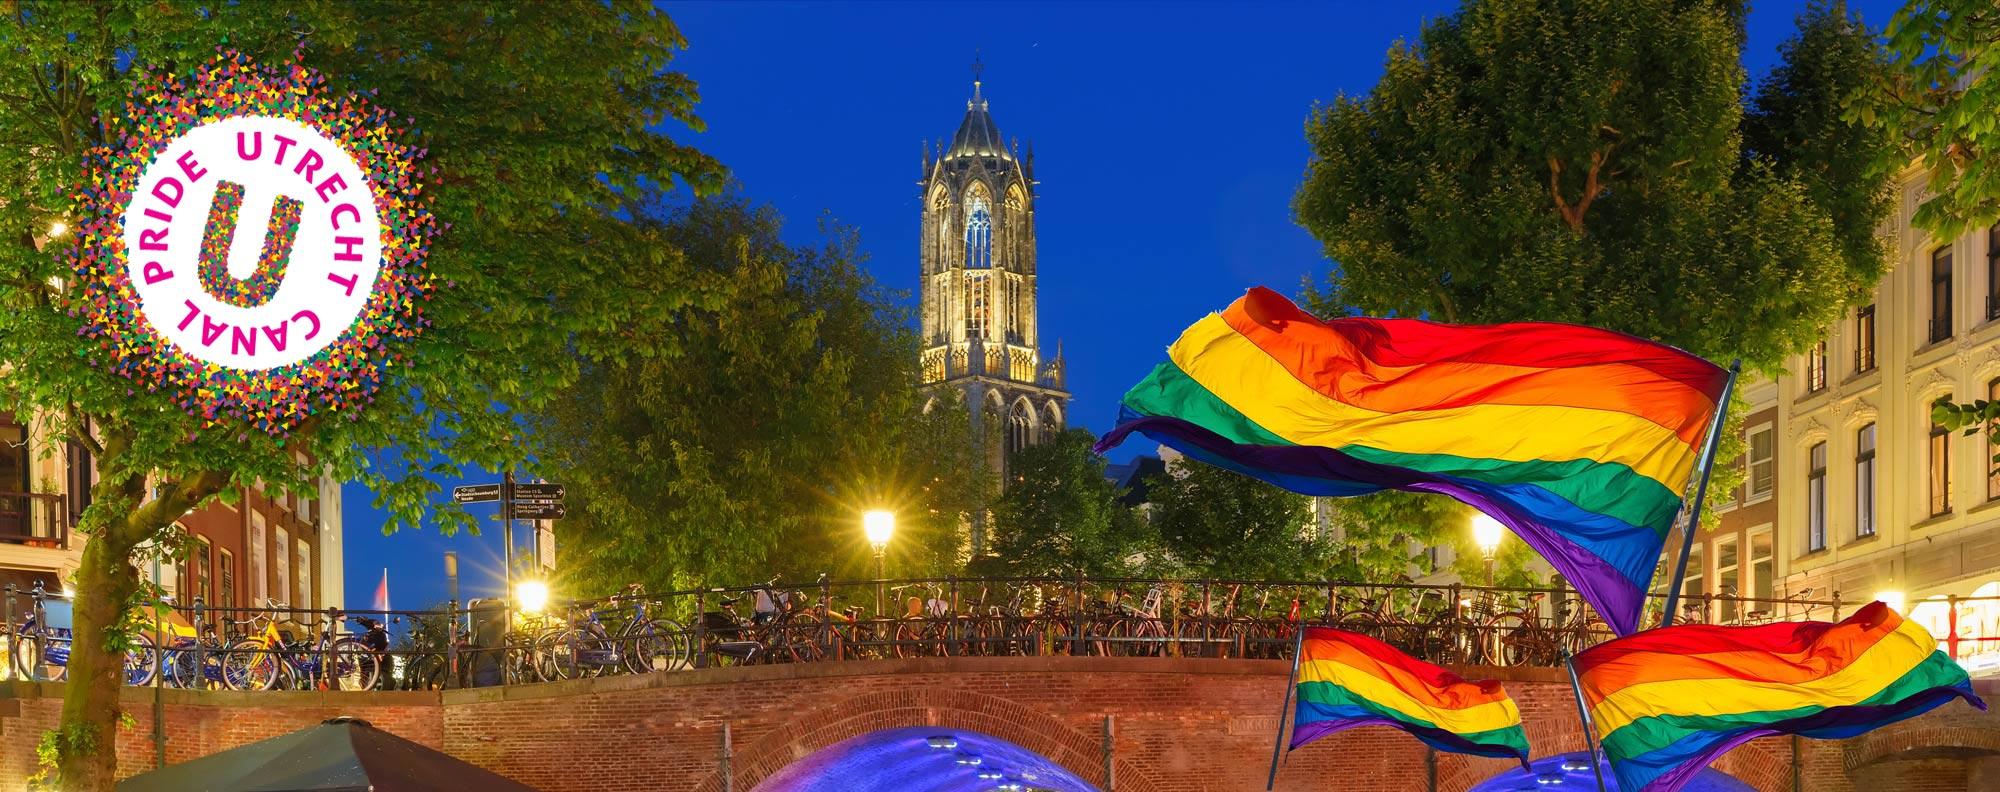 First Utrecht Canal Gay Pride 2017 The Netherlands | Coupleofmen.com